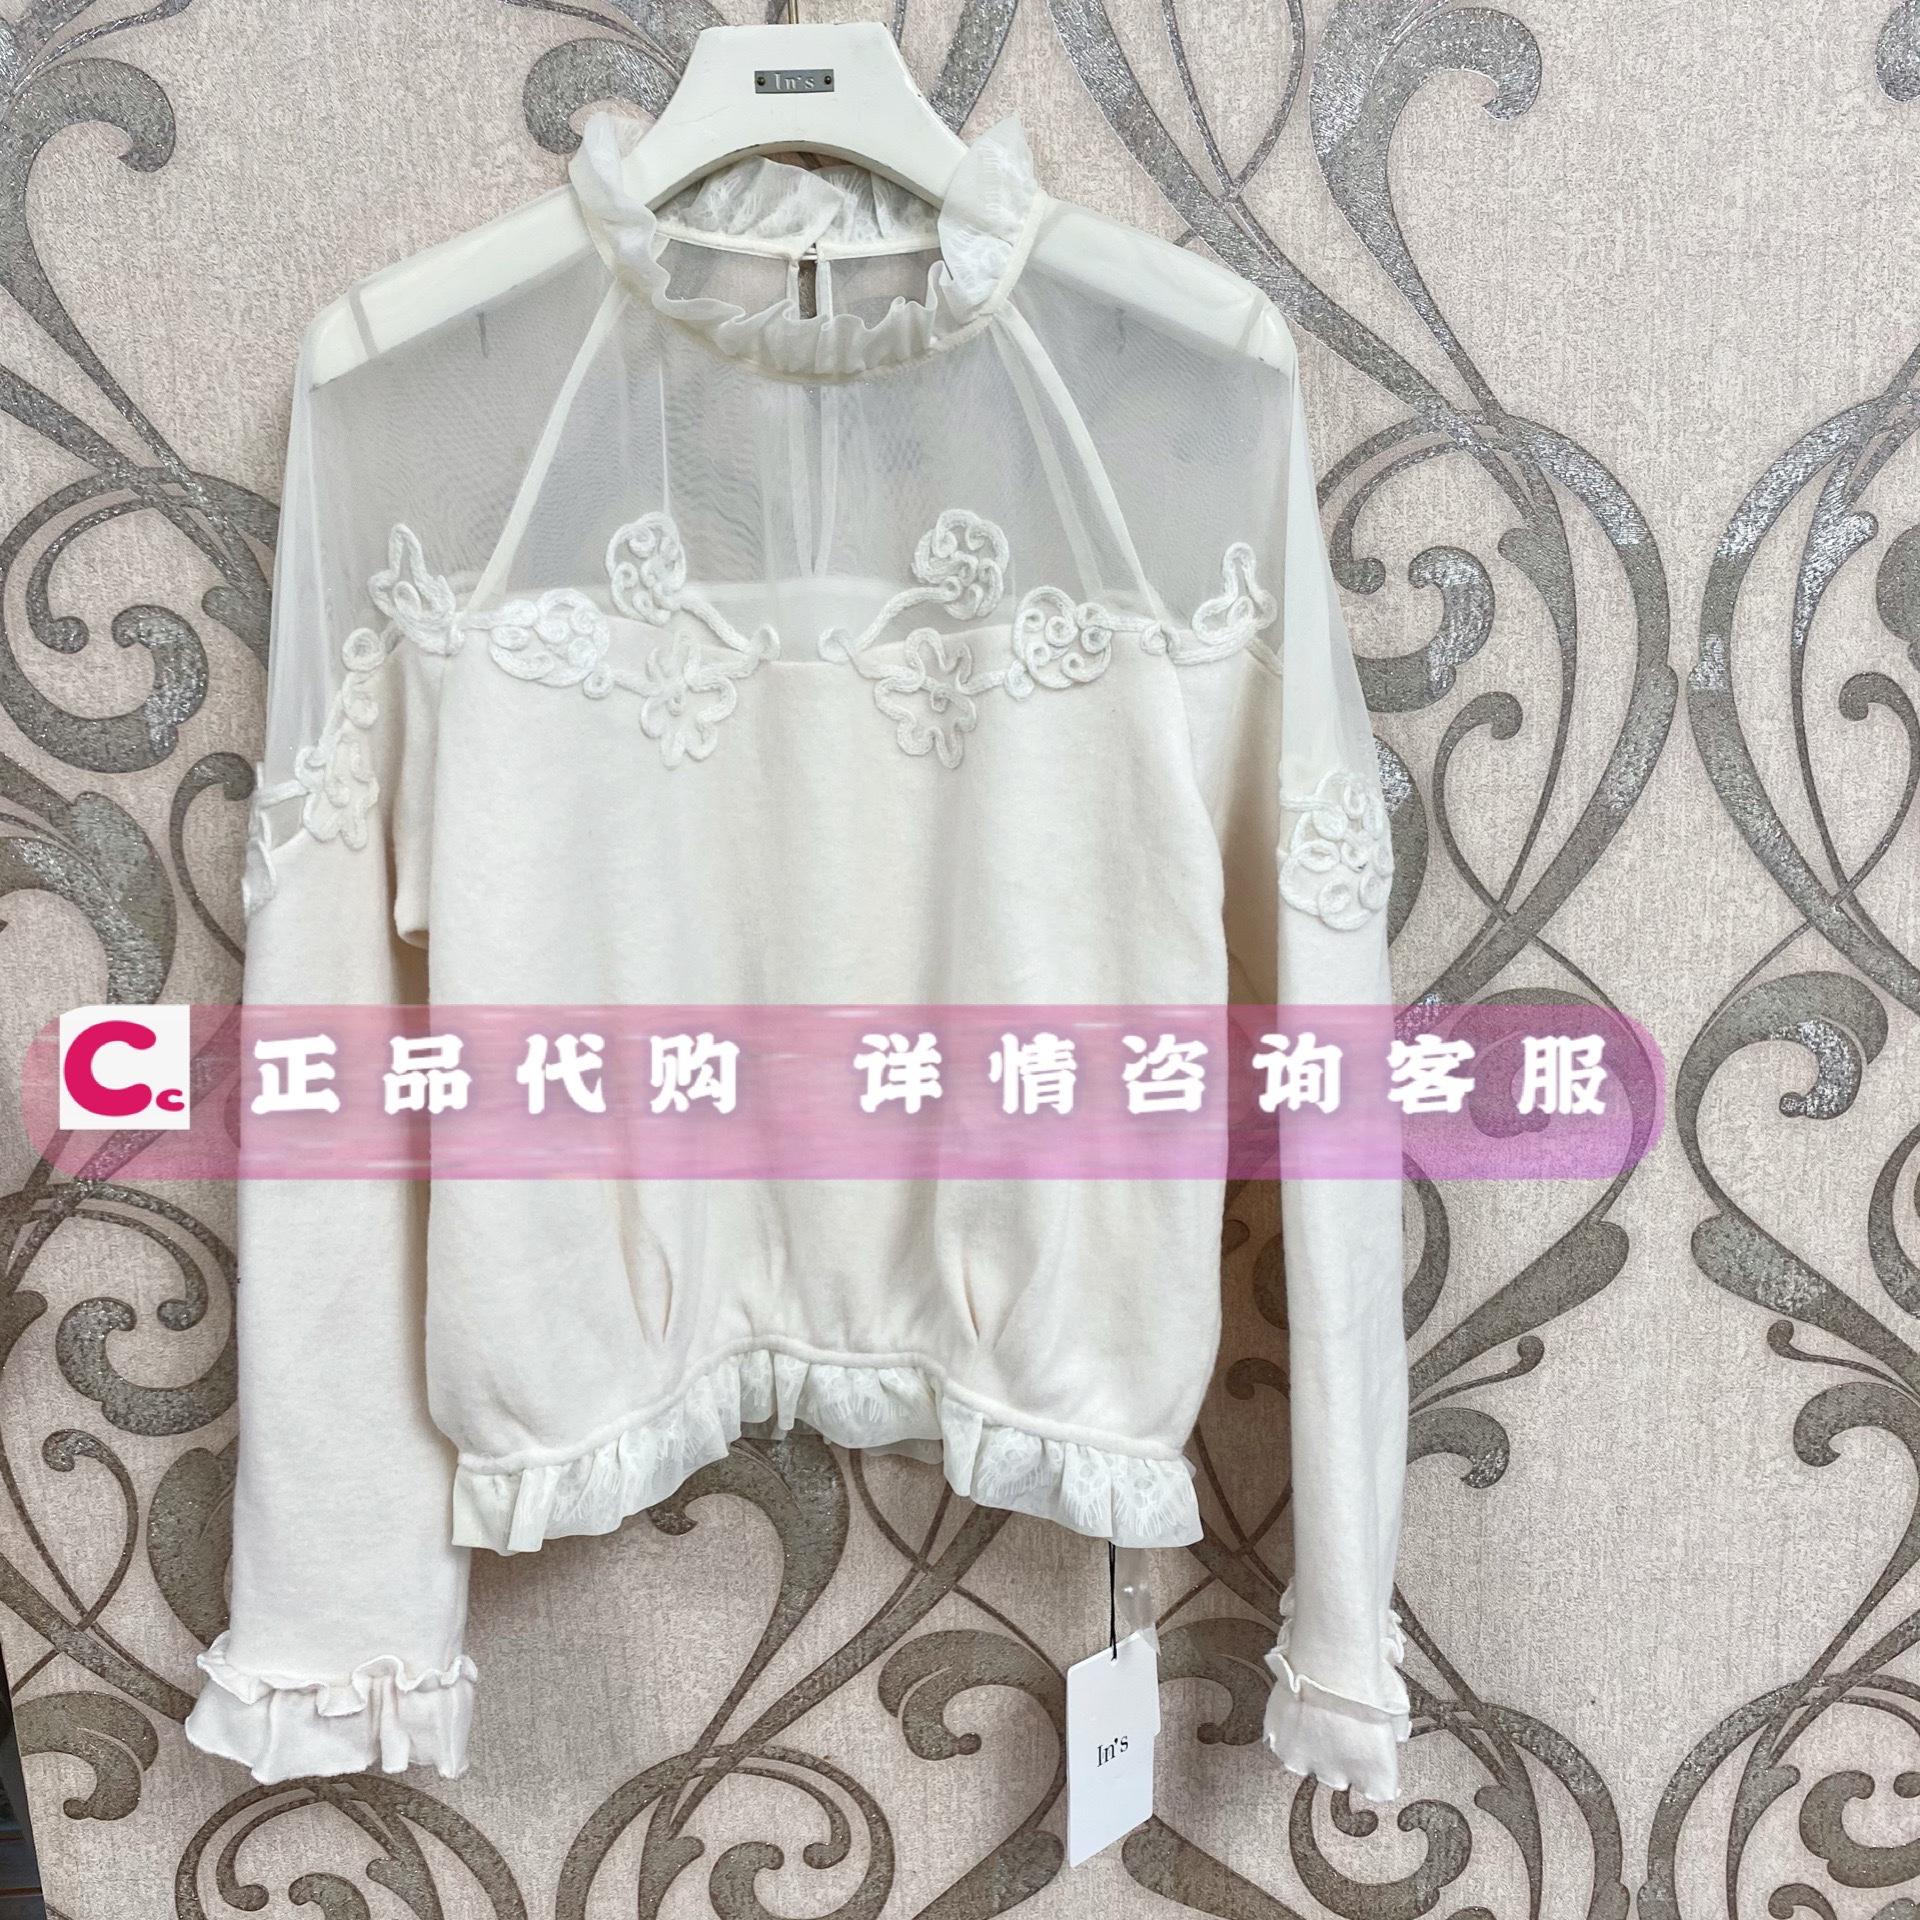 Другие вышивки Артикул 621895396461